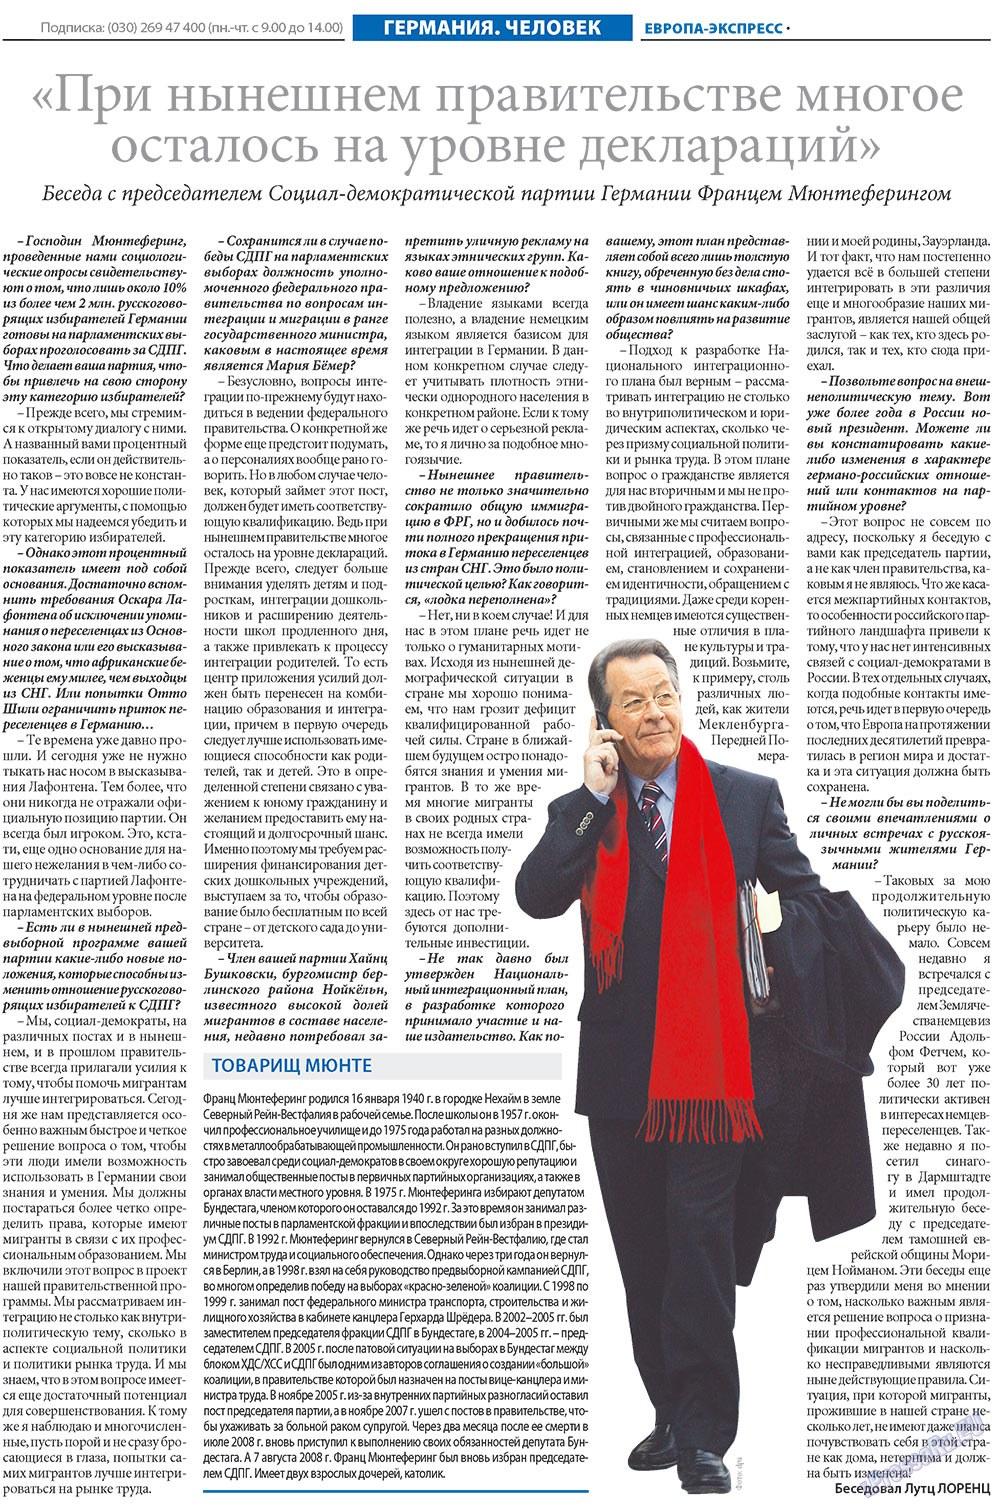 Европа экспресс (газета). 2009 год, номер 19, стр. 4